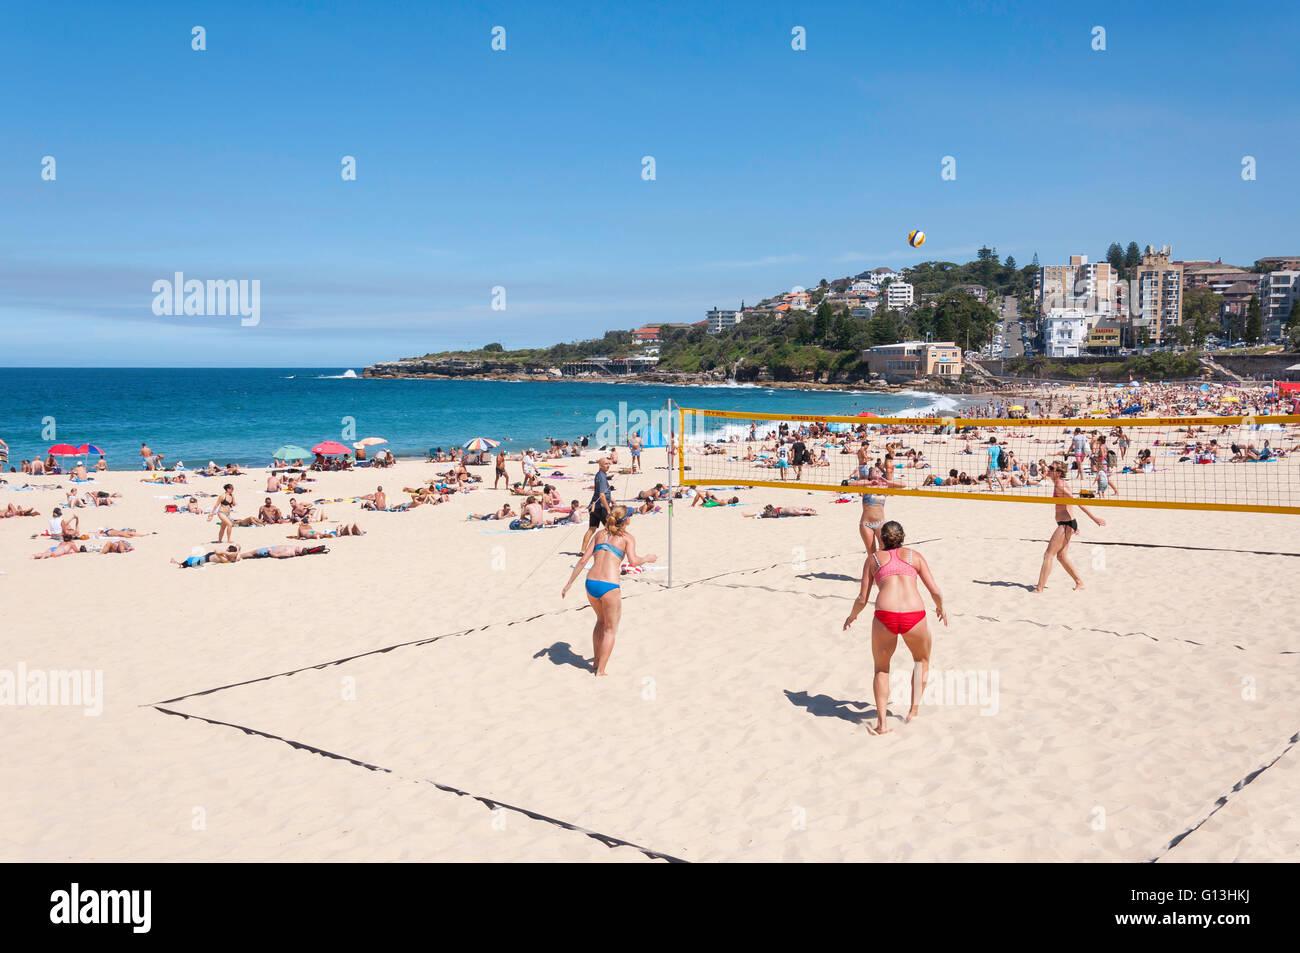 Femmes jouant au beach-volley sur Coogee Beach, Bondi Junction, Sydney, New South Wales, Australia Photo Stock